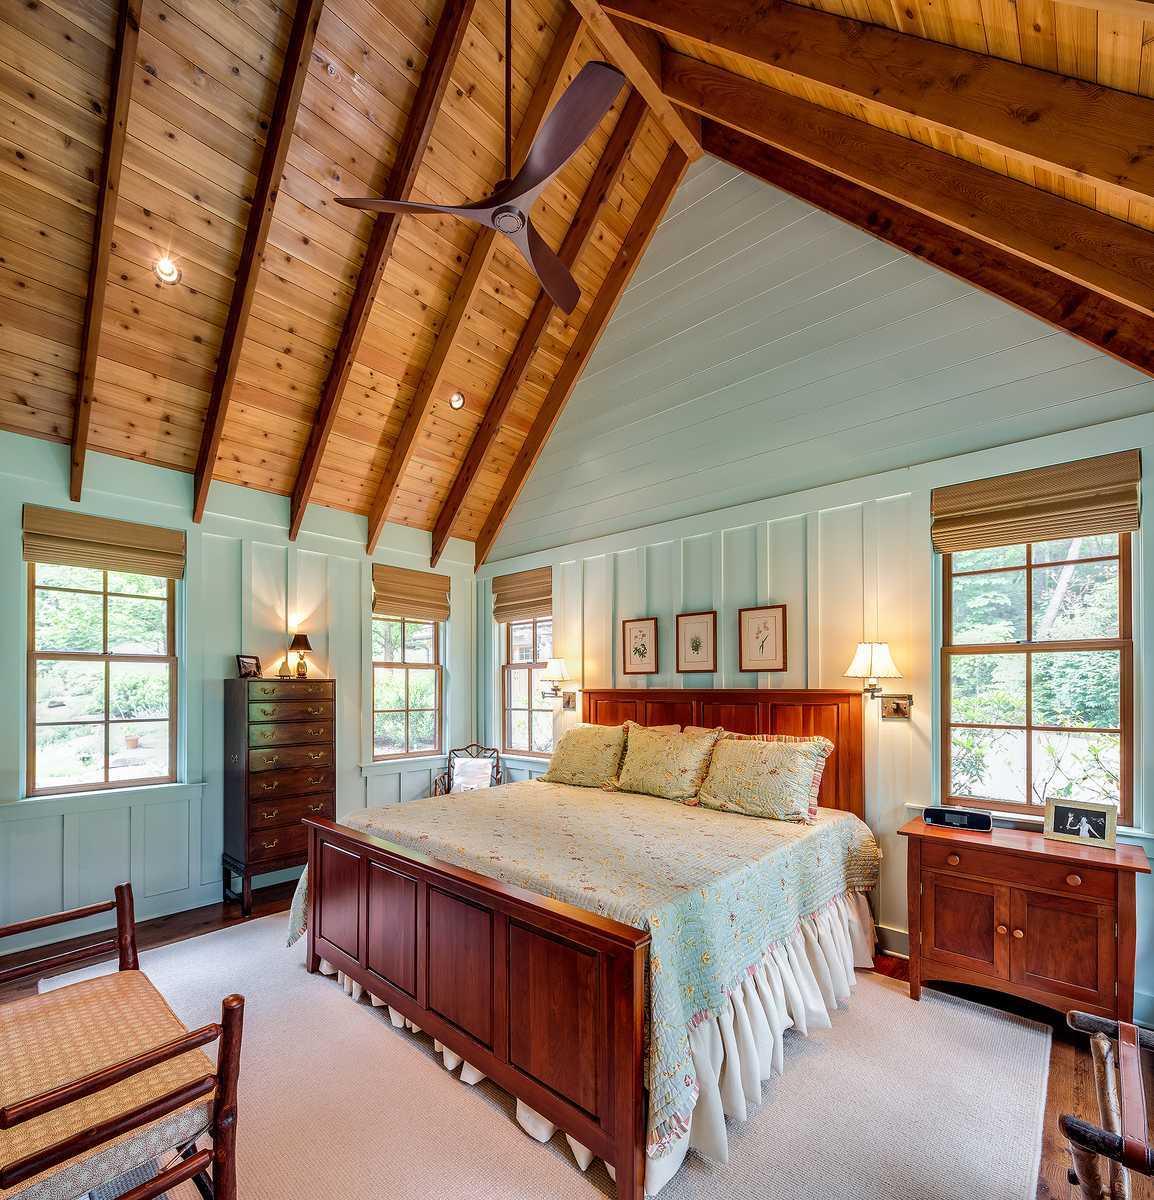 Lonesome Valley bedroom